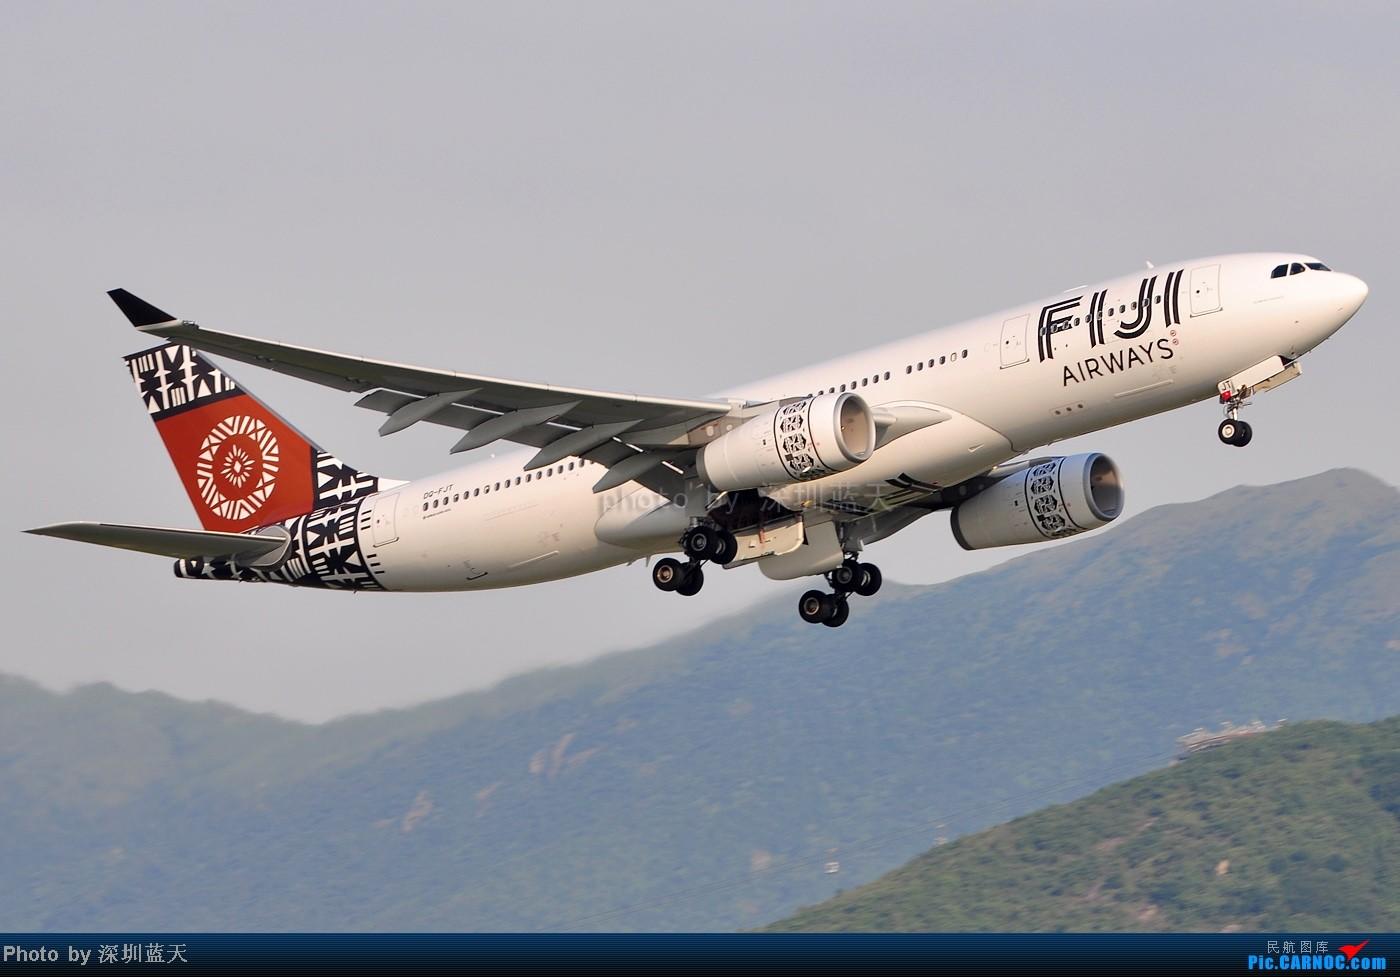 Re:[原创]【深圳飞友会】香港飞机维修区海堤起飞新拍—泰航A380斐济A330新装等 AIRBUS A330-243 DQ-FJT 中国香港赤鱲角国际机场